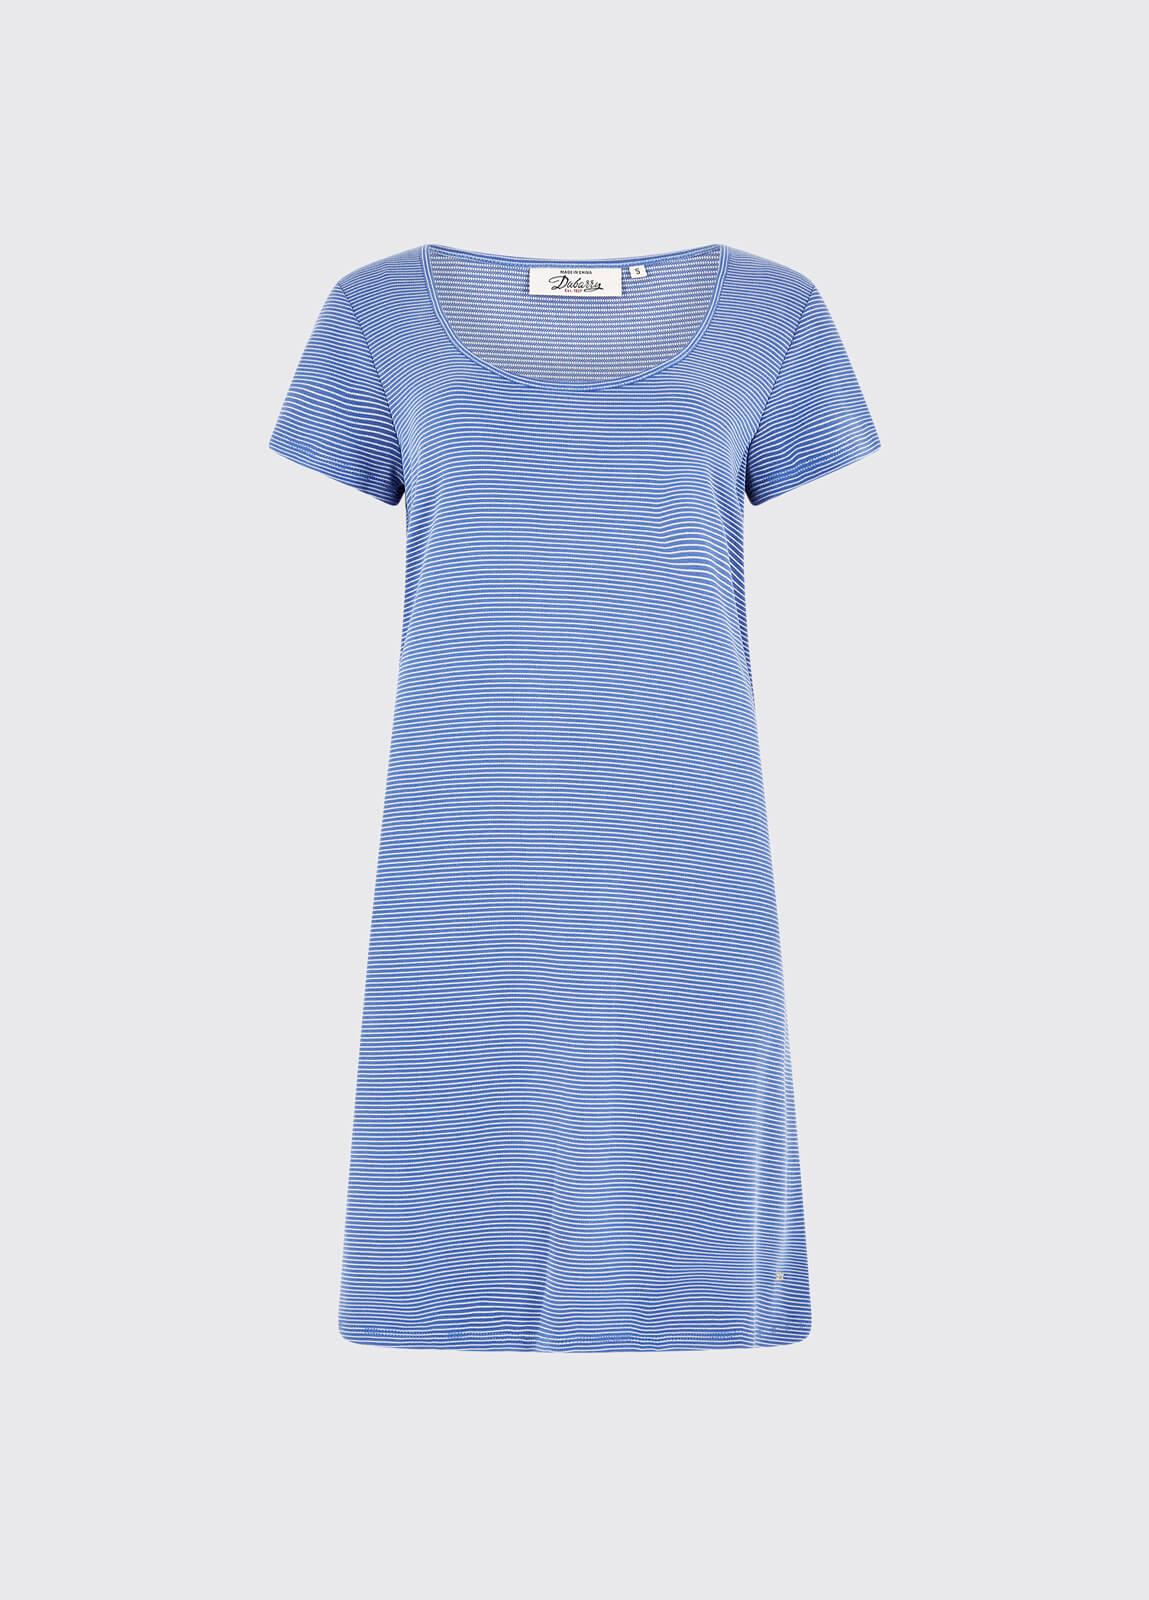 Suncroft Dress - Royal Blue